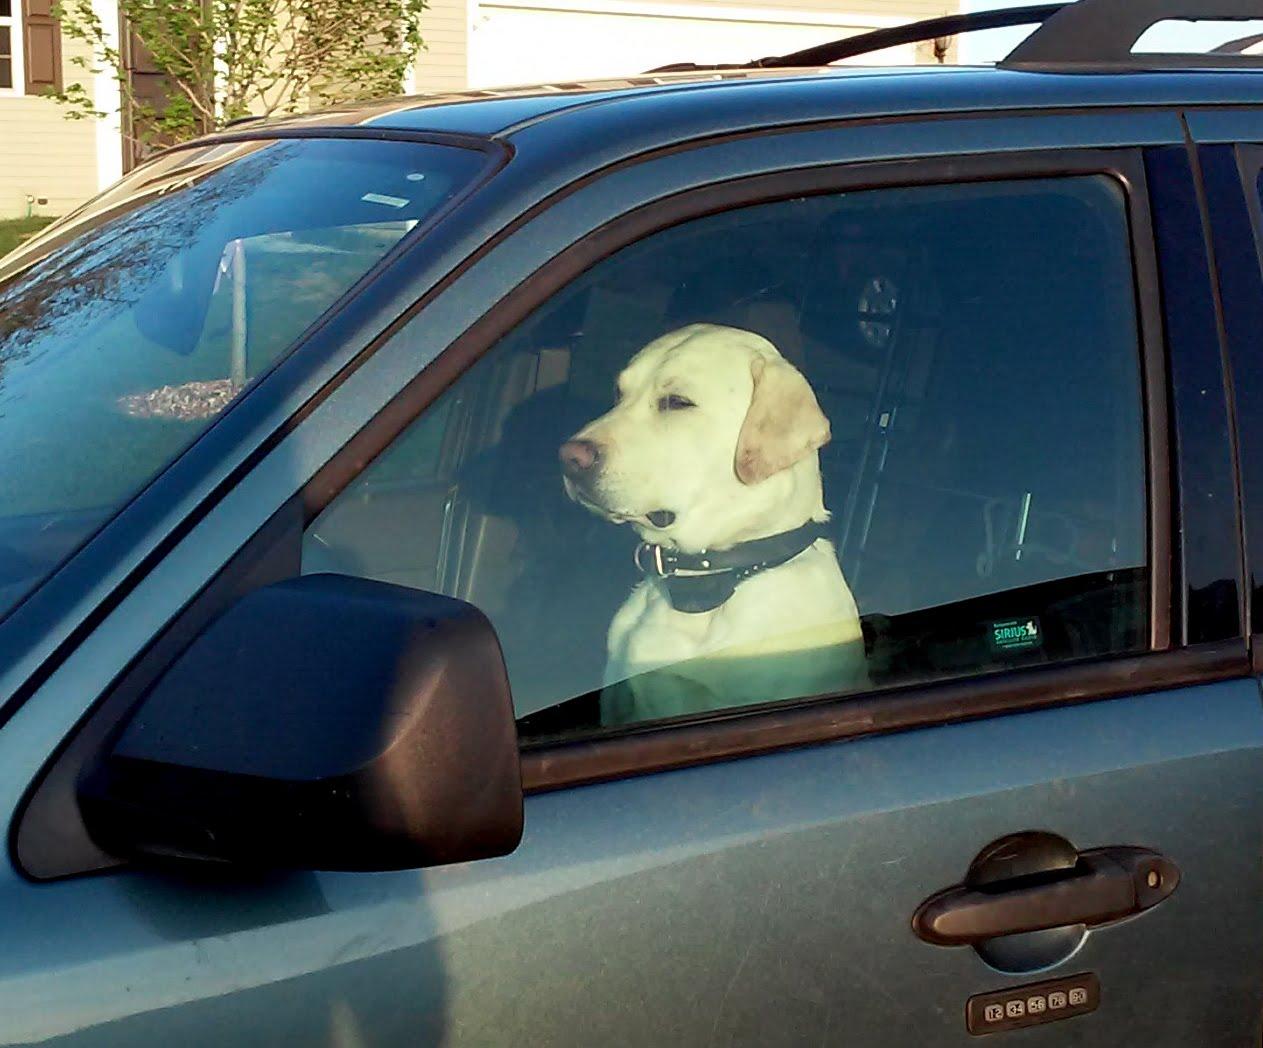 Dog sitting in the car